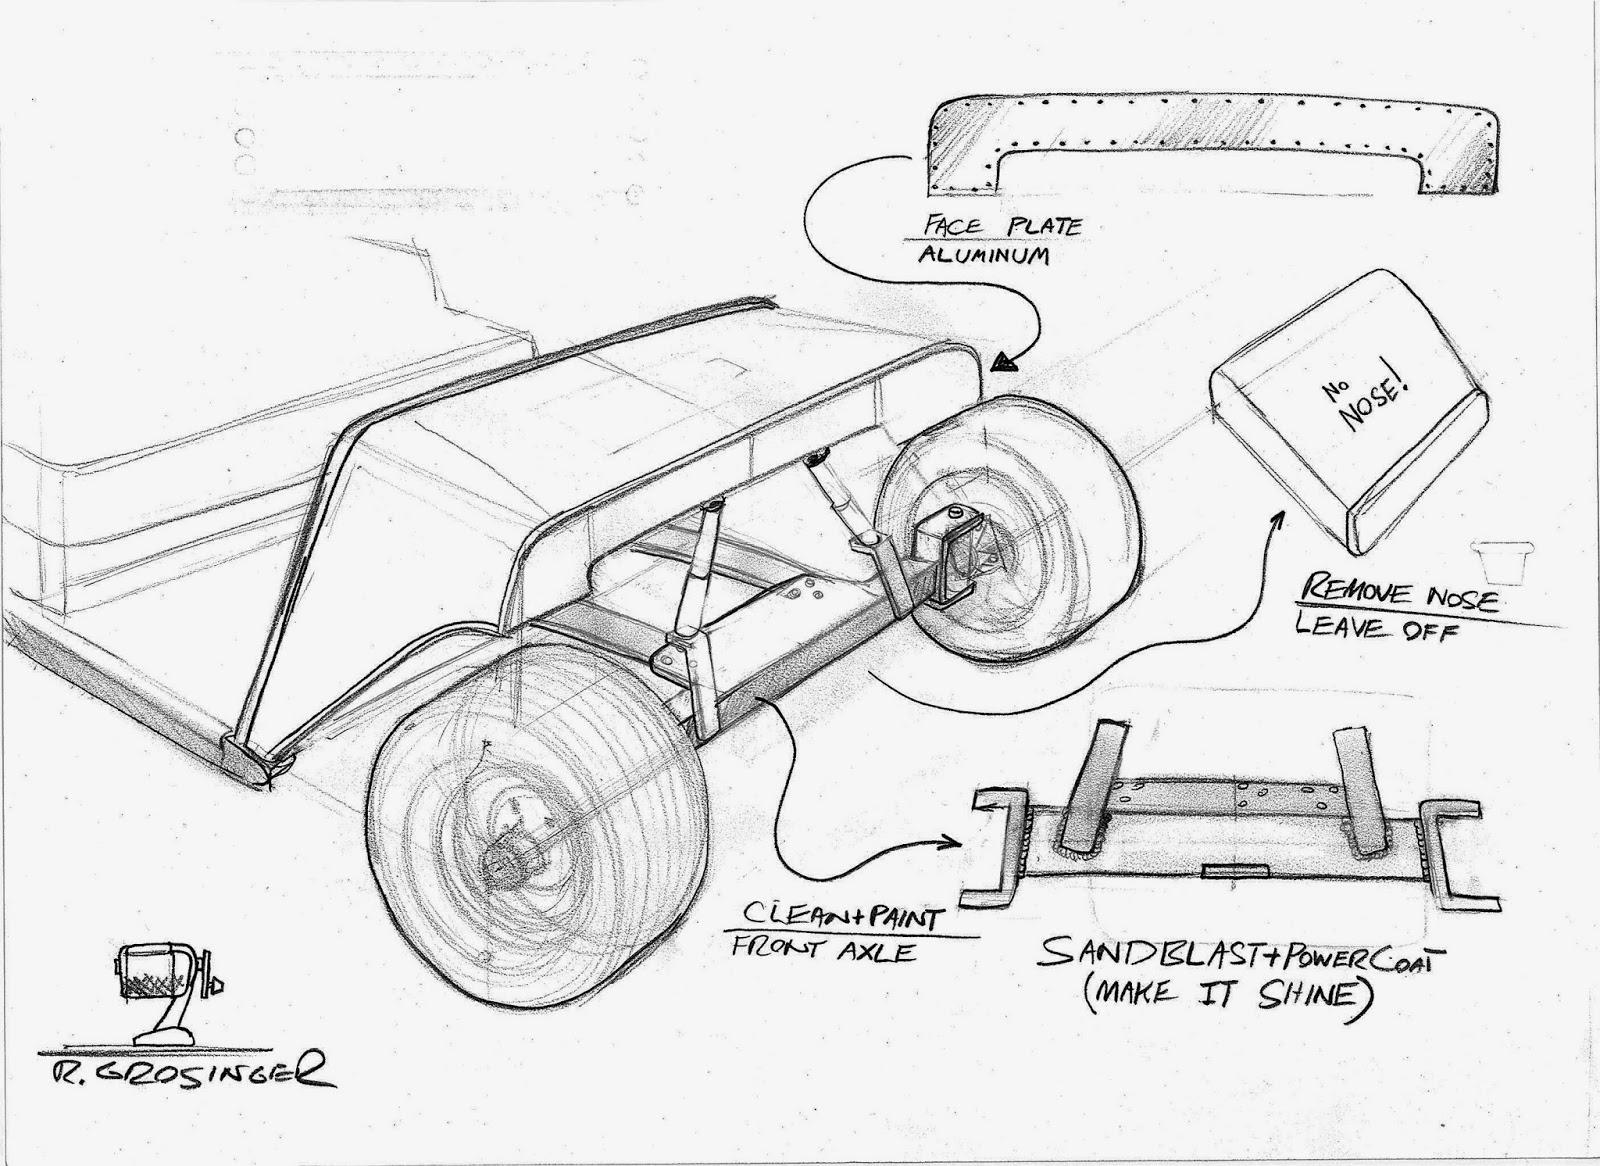 Ron Grosinger S Vehicle Design Electric Wheelie Golf Cart